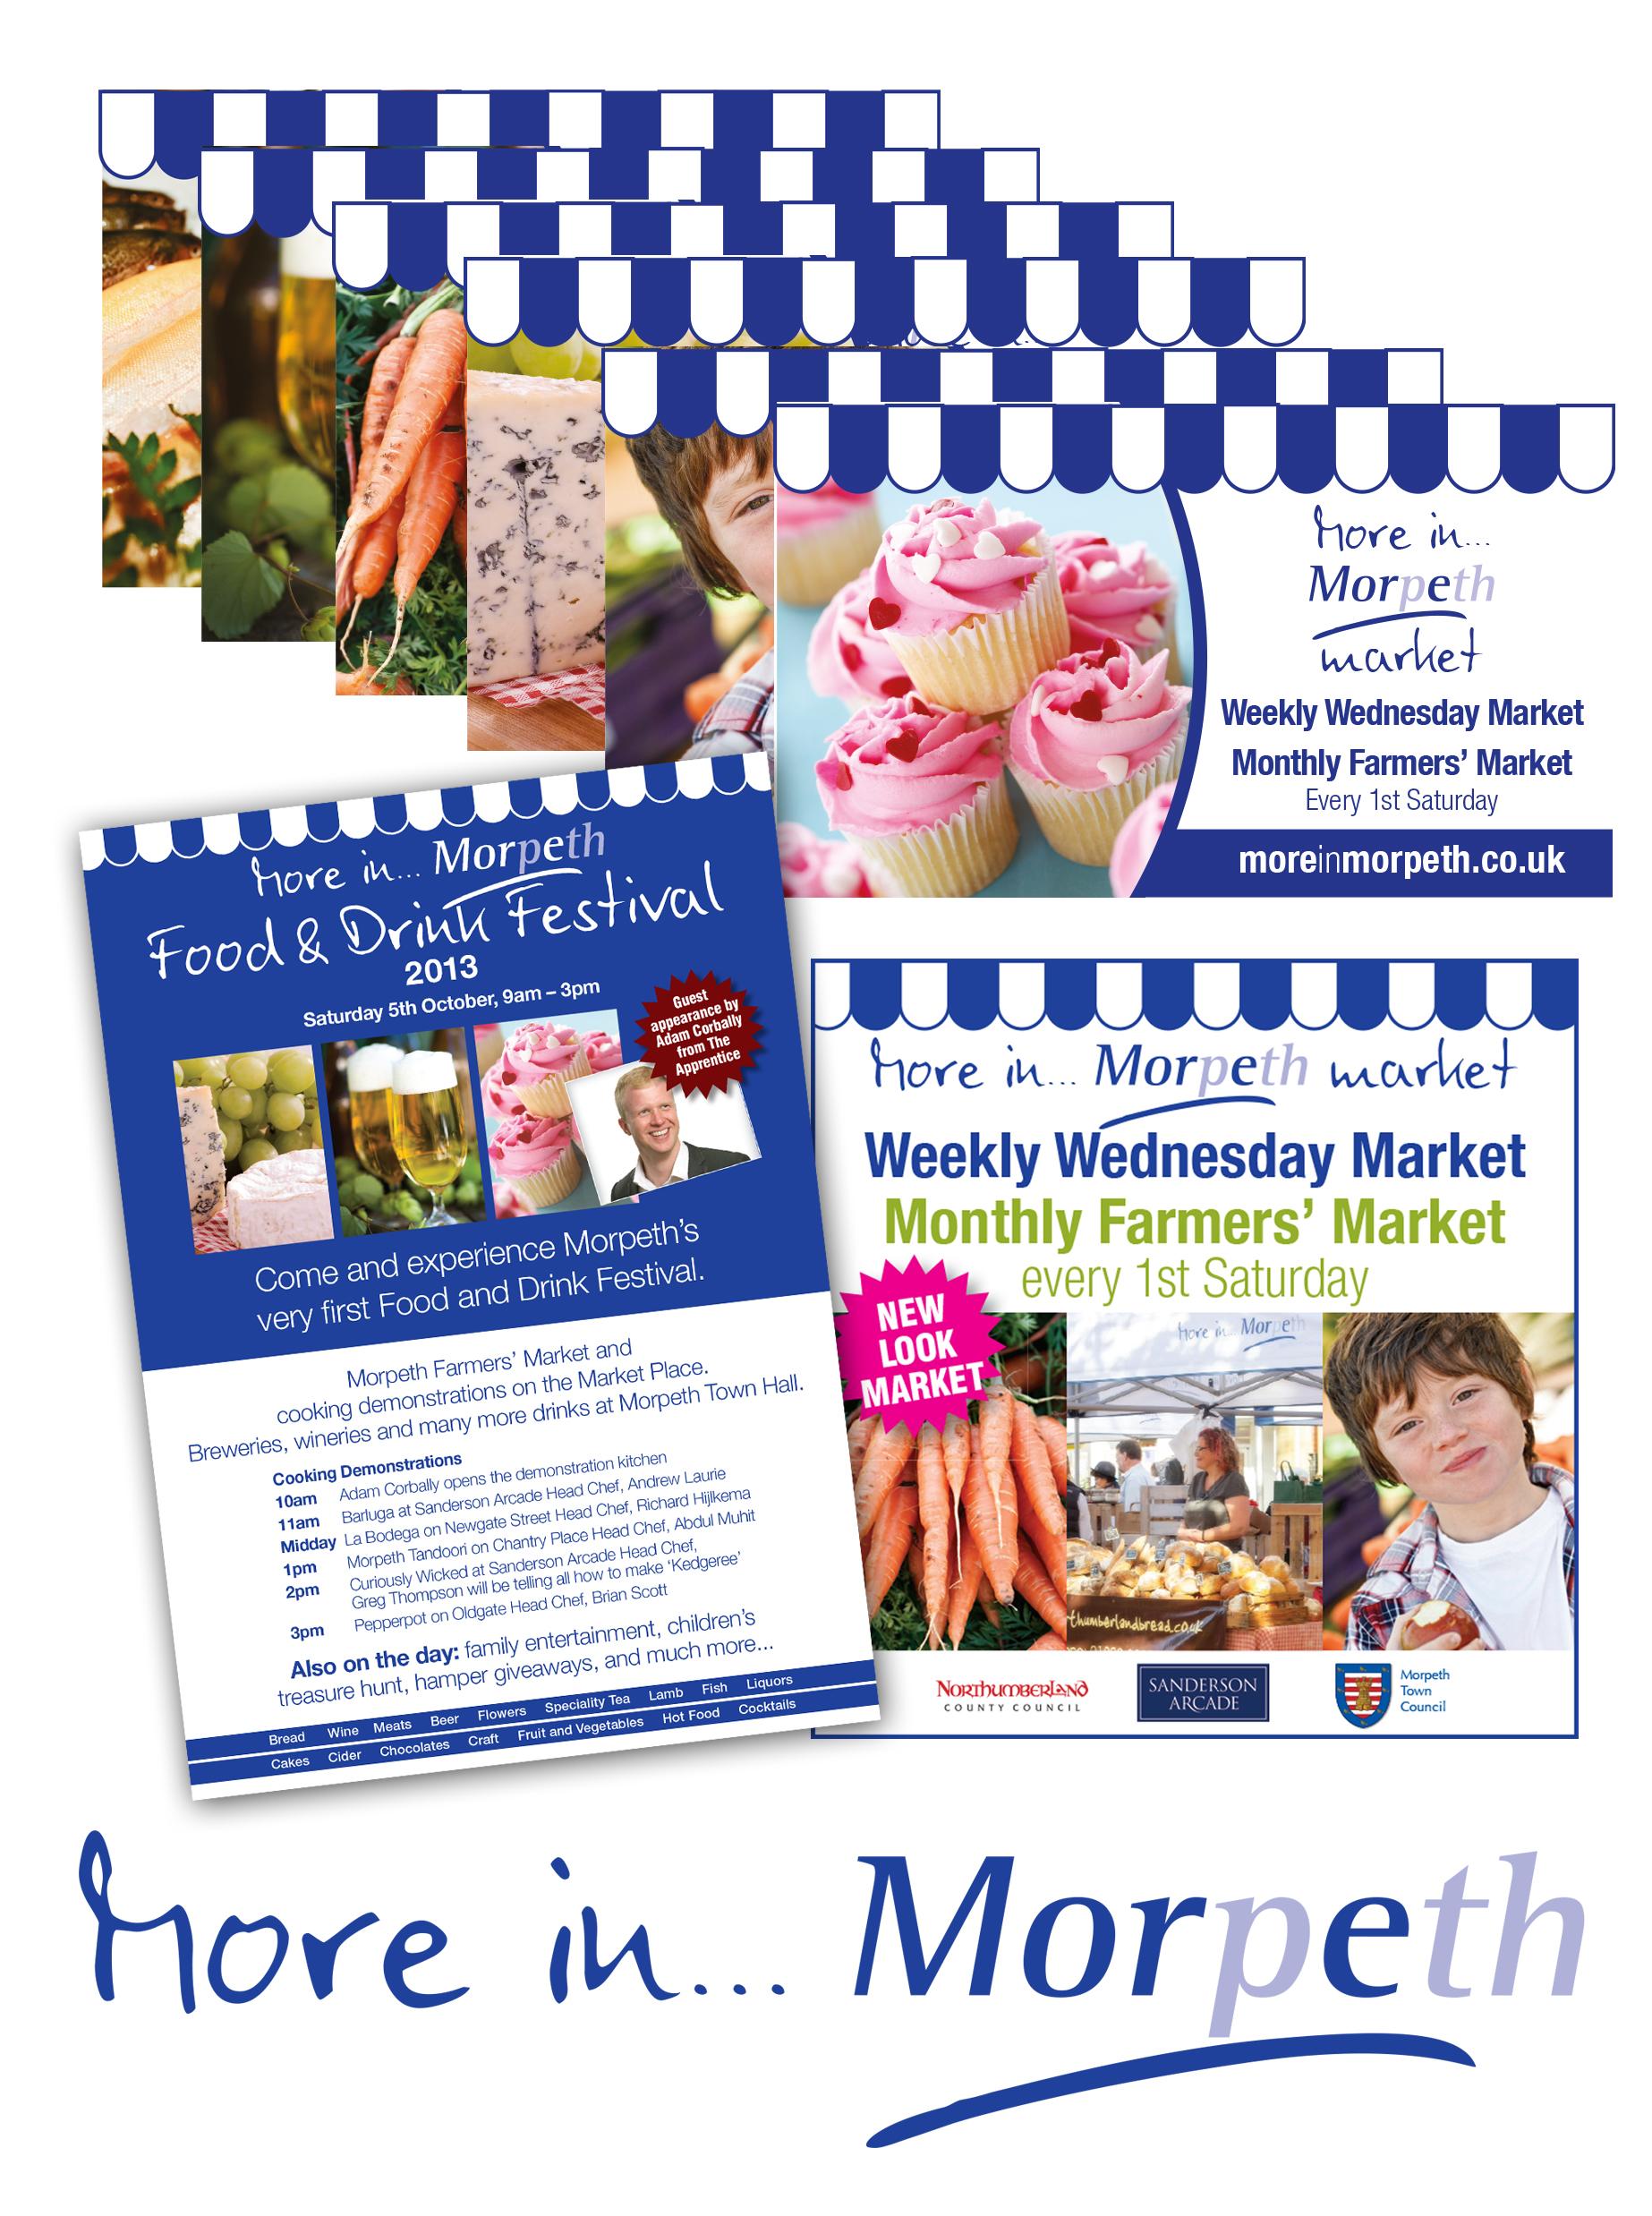 Promoting Morpeth's Food & Drink Festival